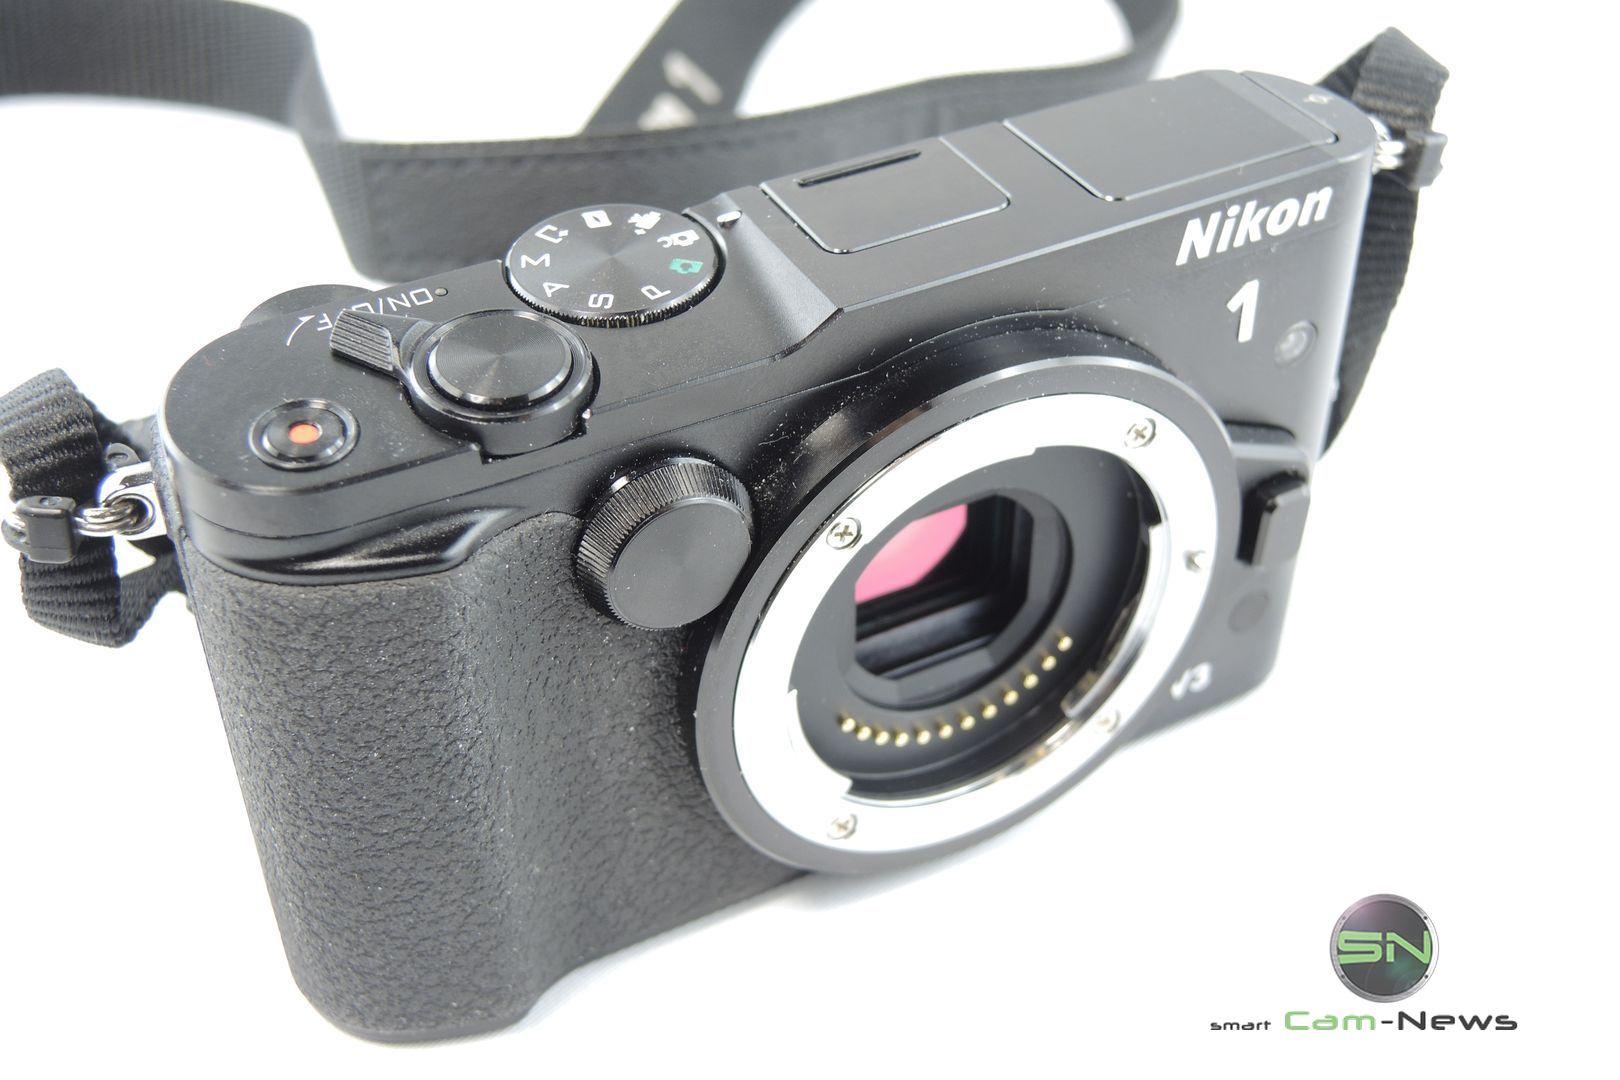 Frontansicht - Nikon 1 V3 - SmartCamNews